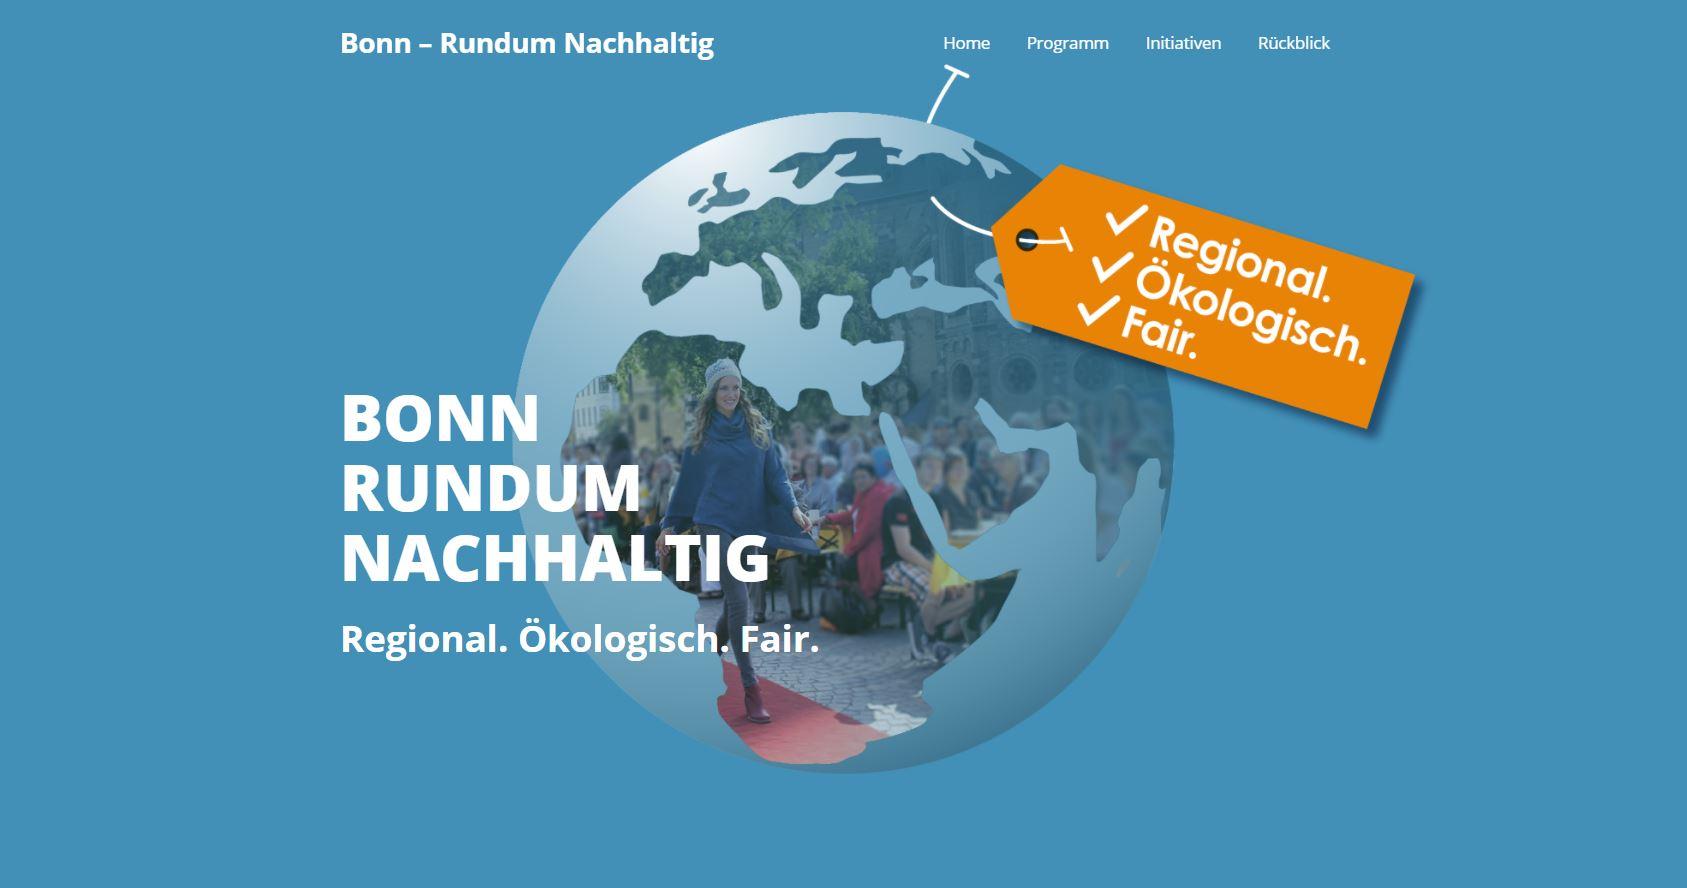 Bonn – Rundum Nachhaltig Website